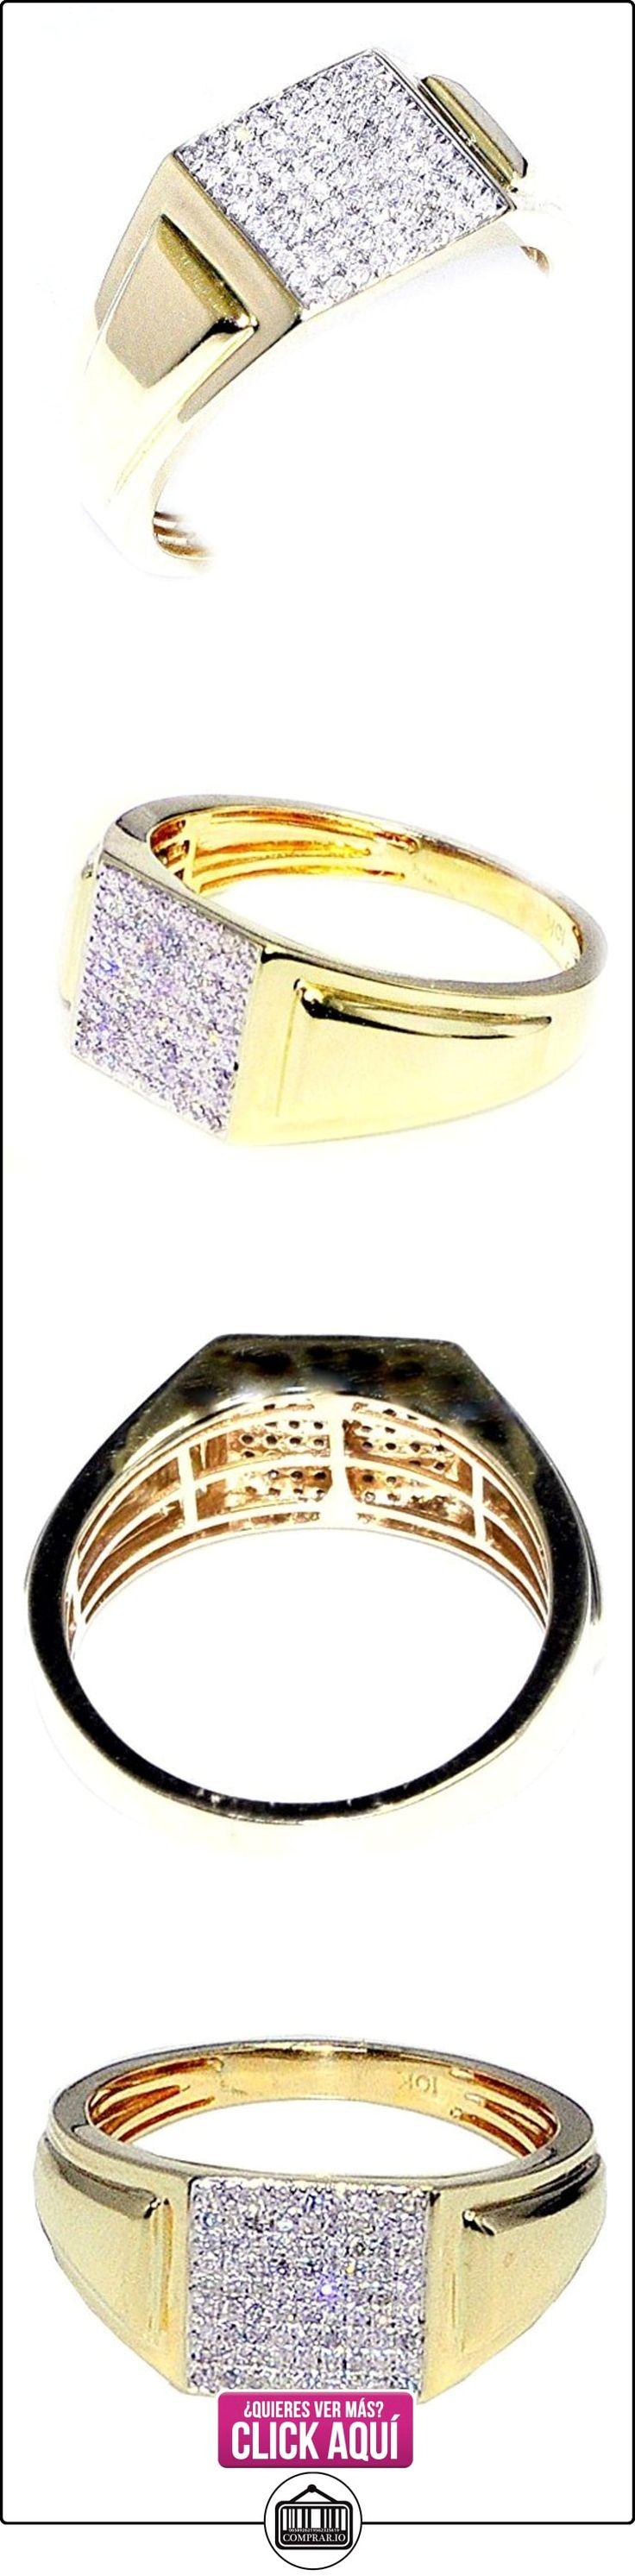 Midwest joyería hombres del anillo de diamante 10K oro 1/4cttw moda PINKY anillo 10mm de ancho (I/J color 0,26quilates)  ✿ Joyas para hombres especiales - lujo ✿ ▬► Ver oferta: https://comprar.io/goto/B00SDMAO08